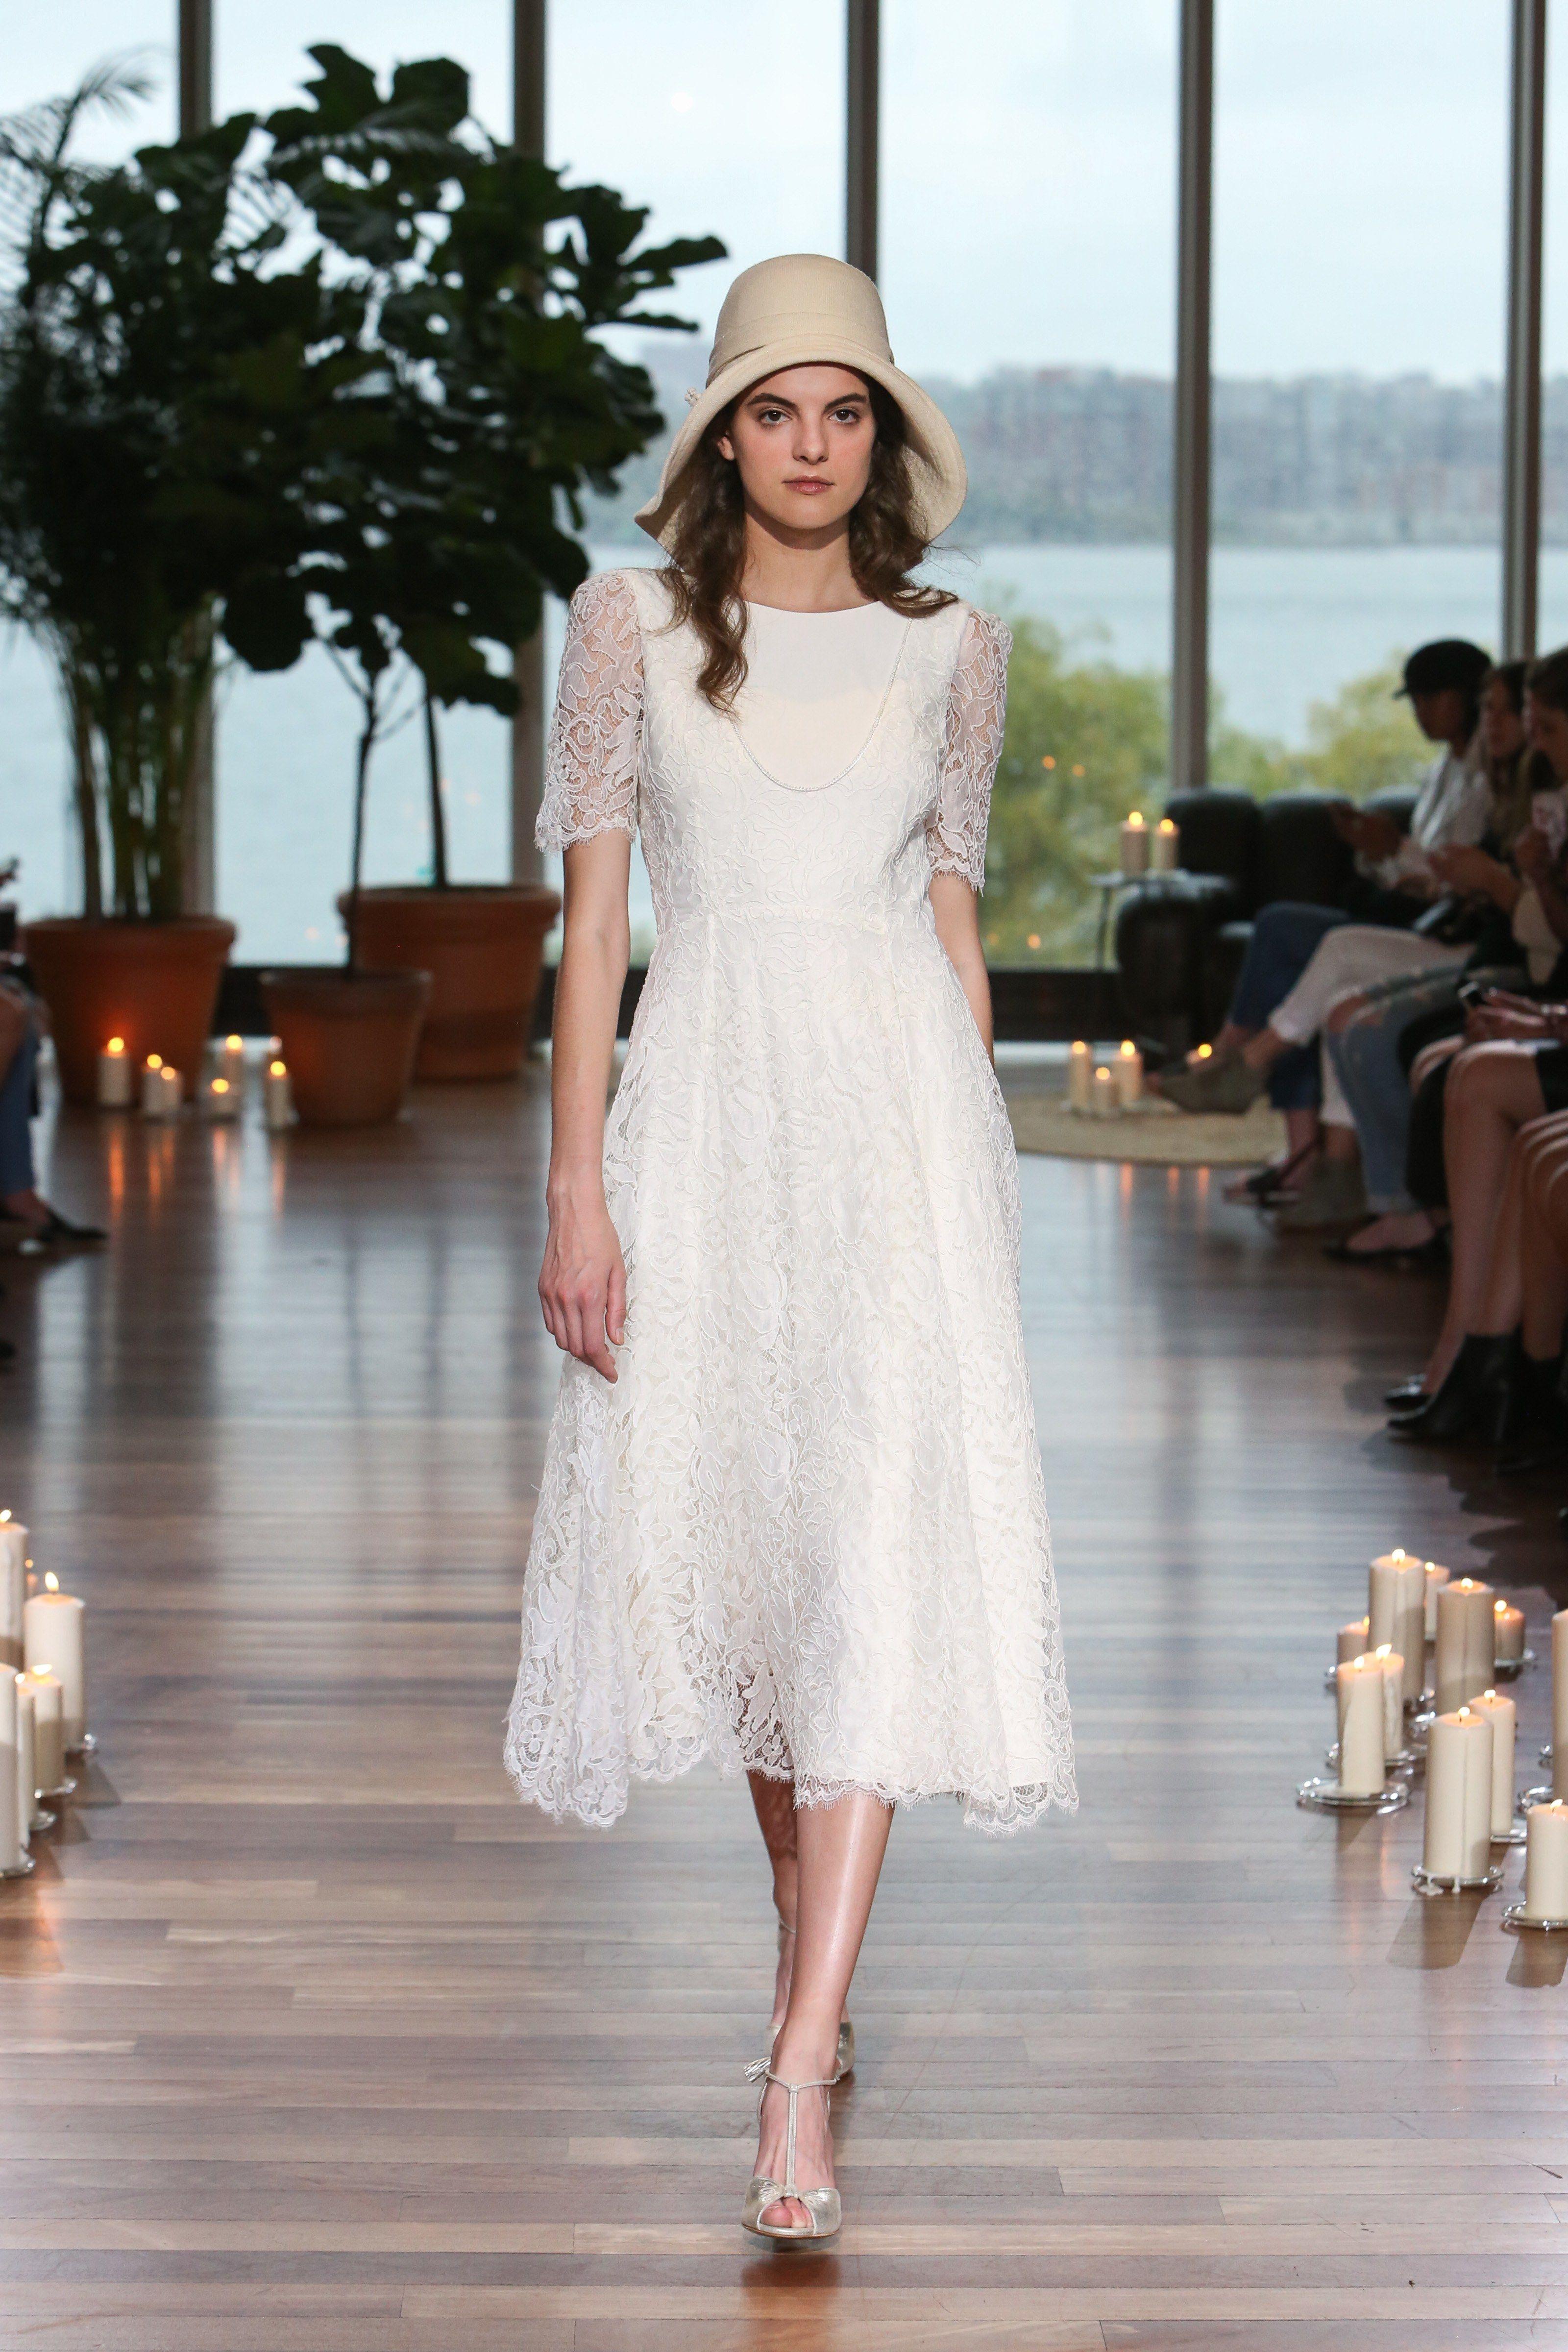 Tea Length Wedding Dress Trends 2018